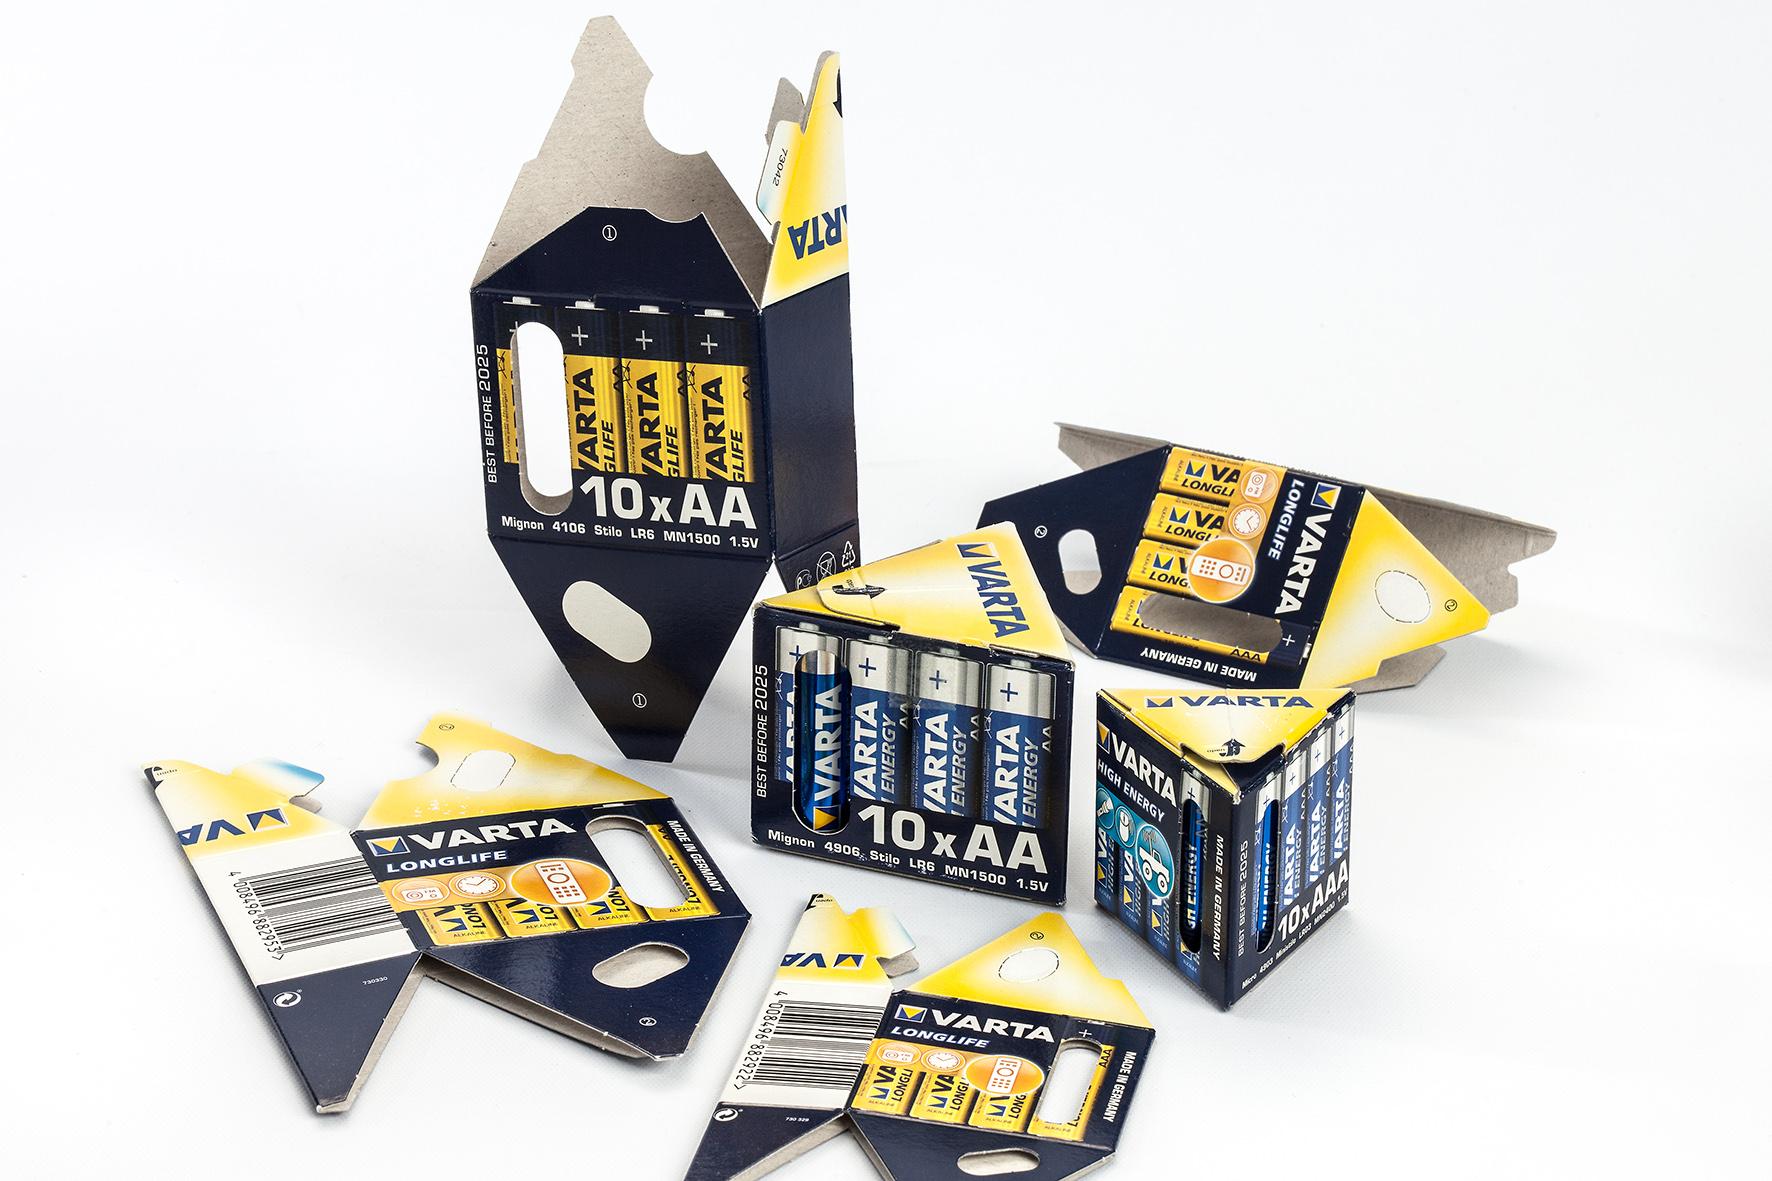 carton-award-image 129441